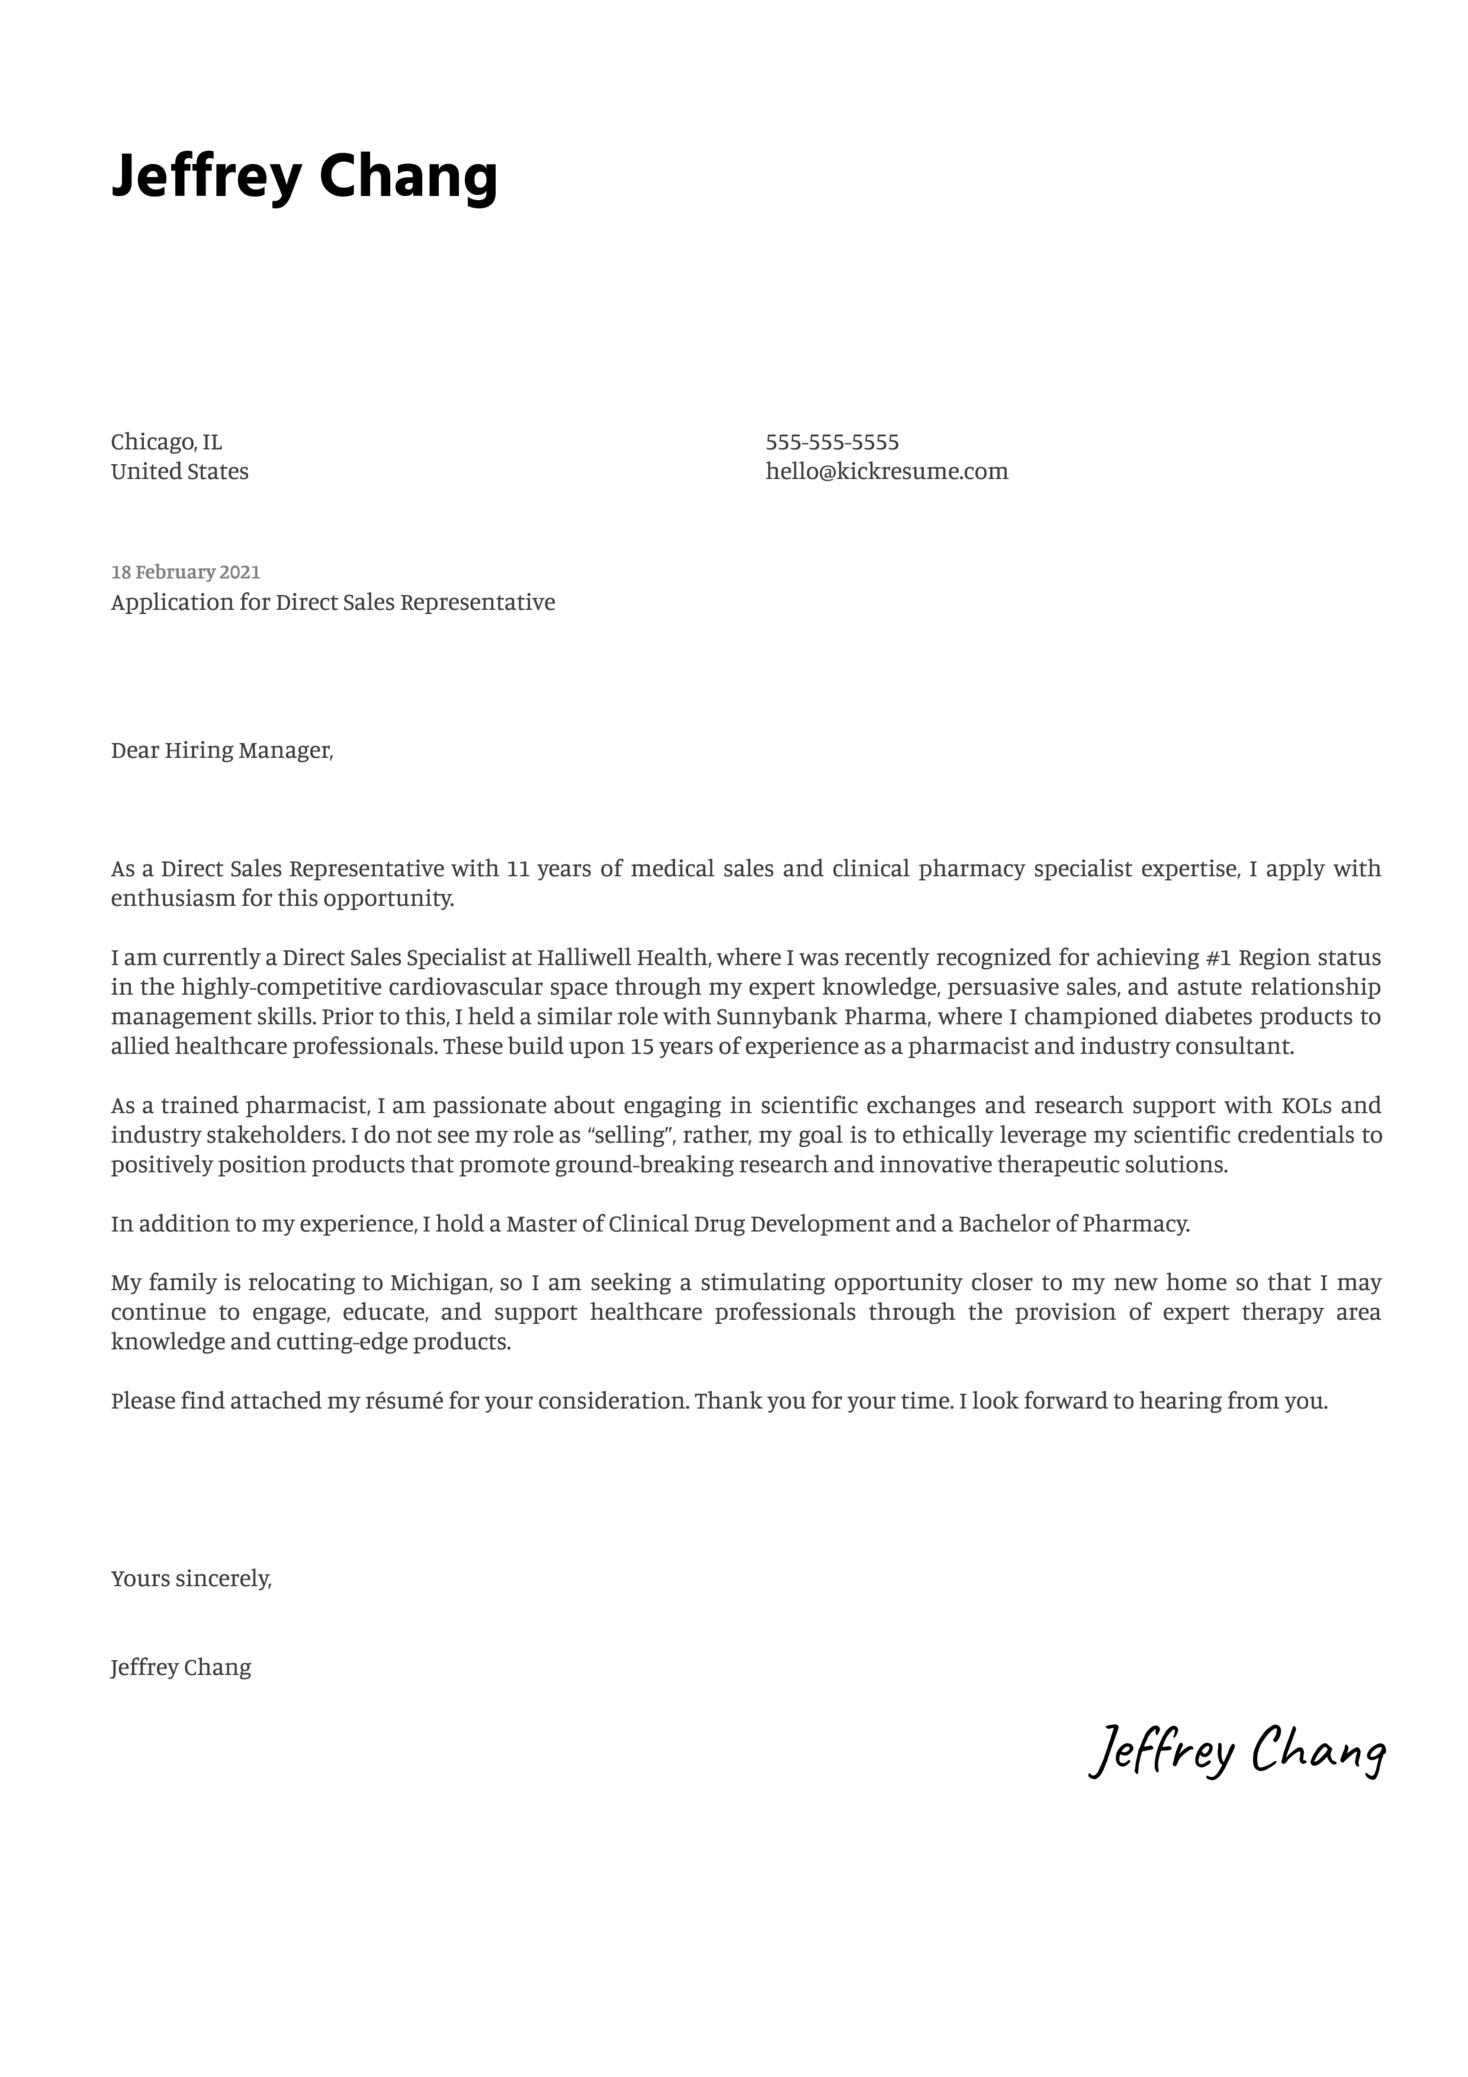 Direct Sales Representative Cover Letter Example